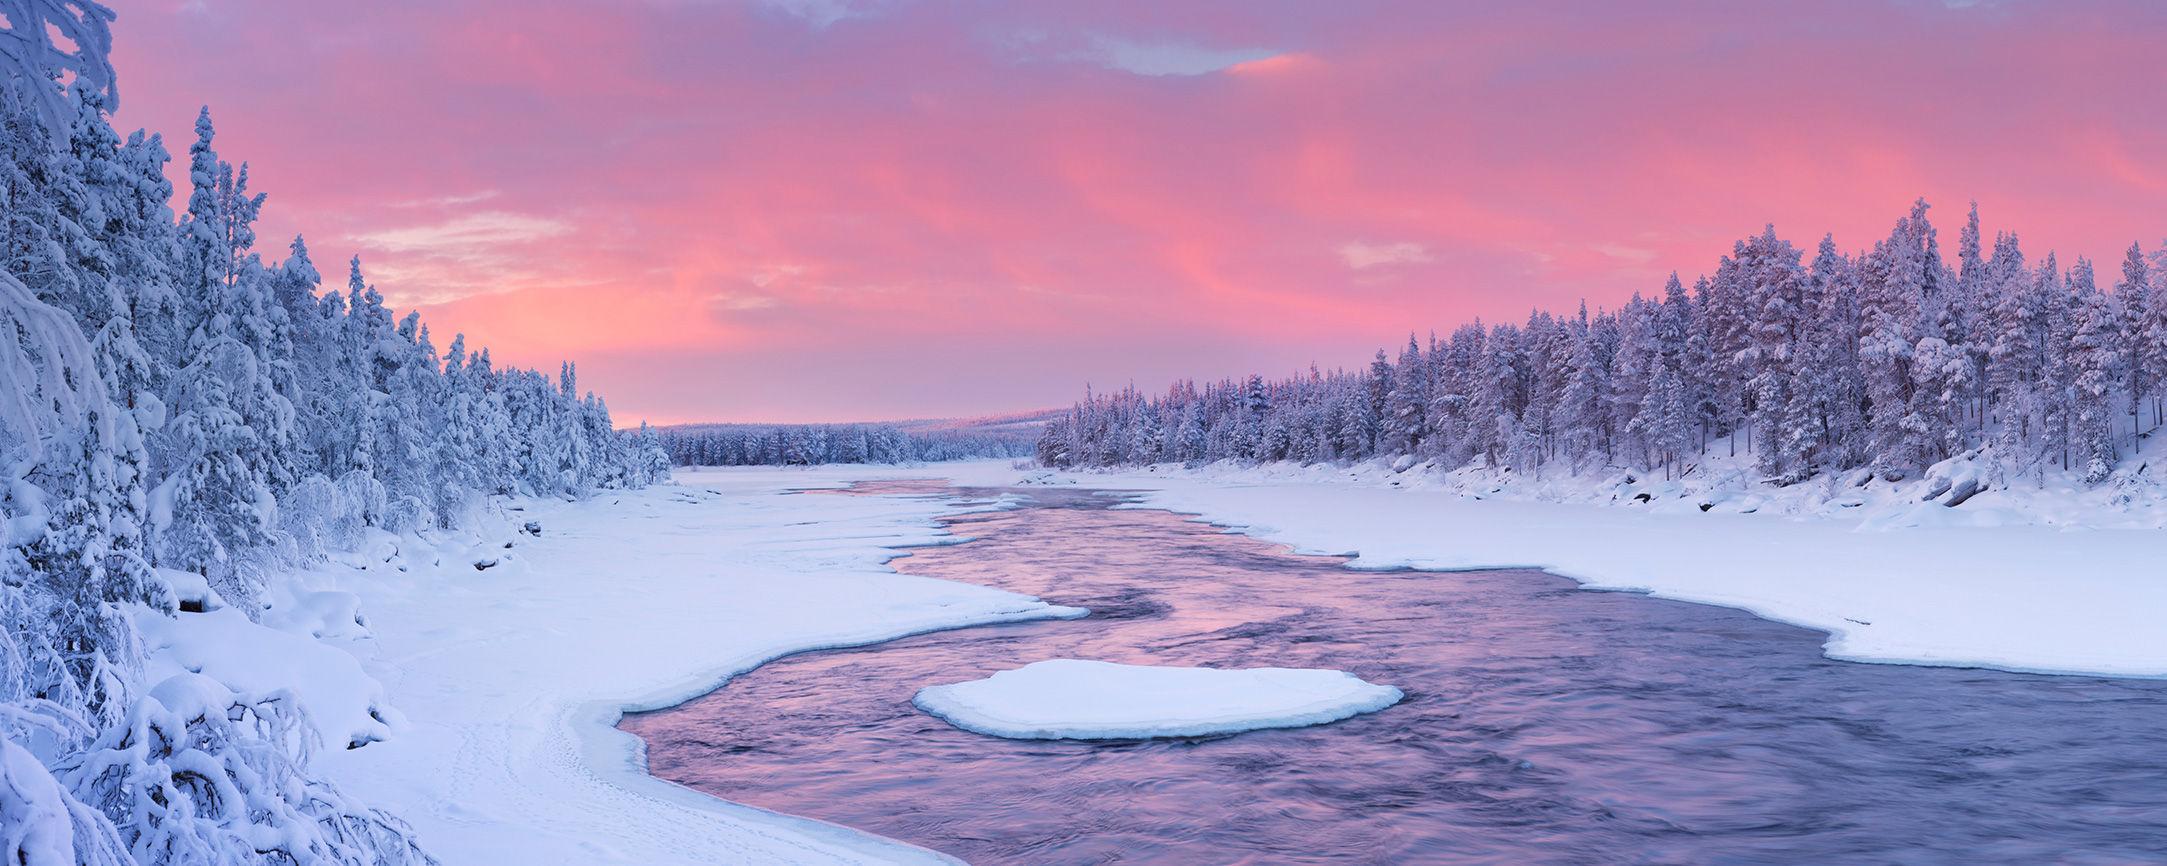 sara_winter | istockphoto.com/